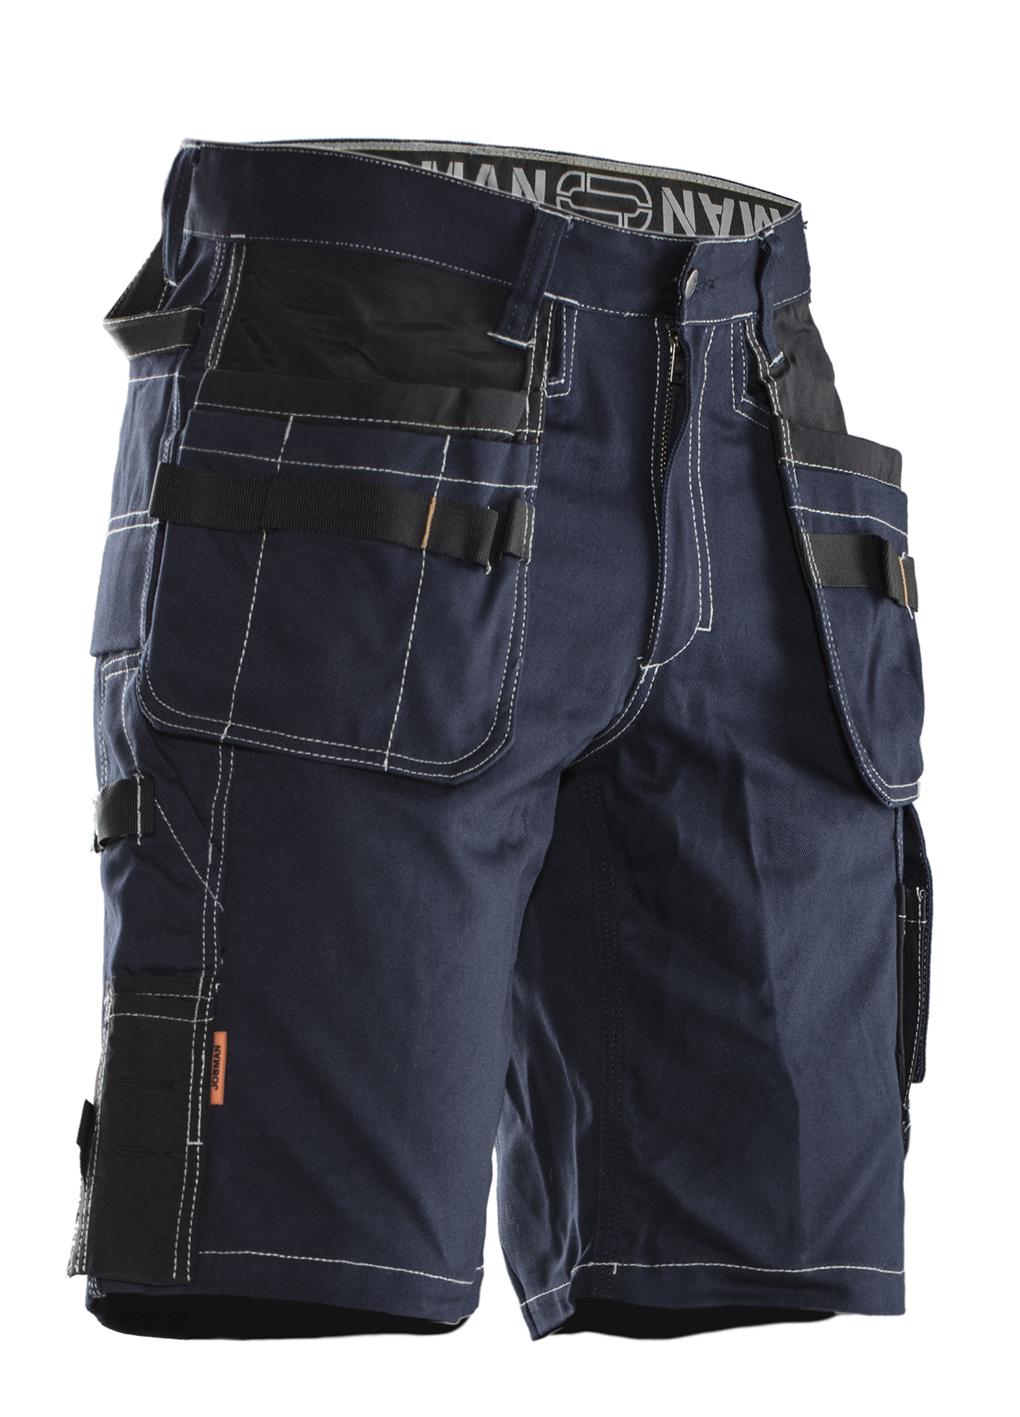 2733 Short d'artisan Coton C44 bleu marine/noir